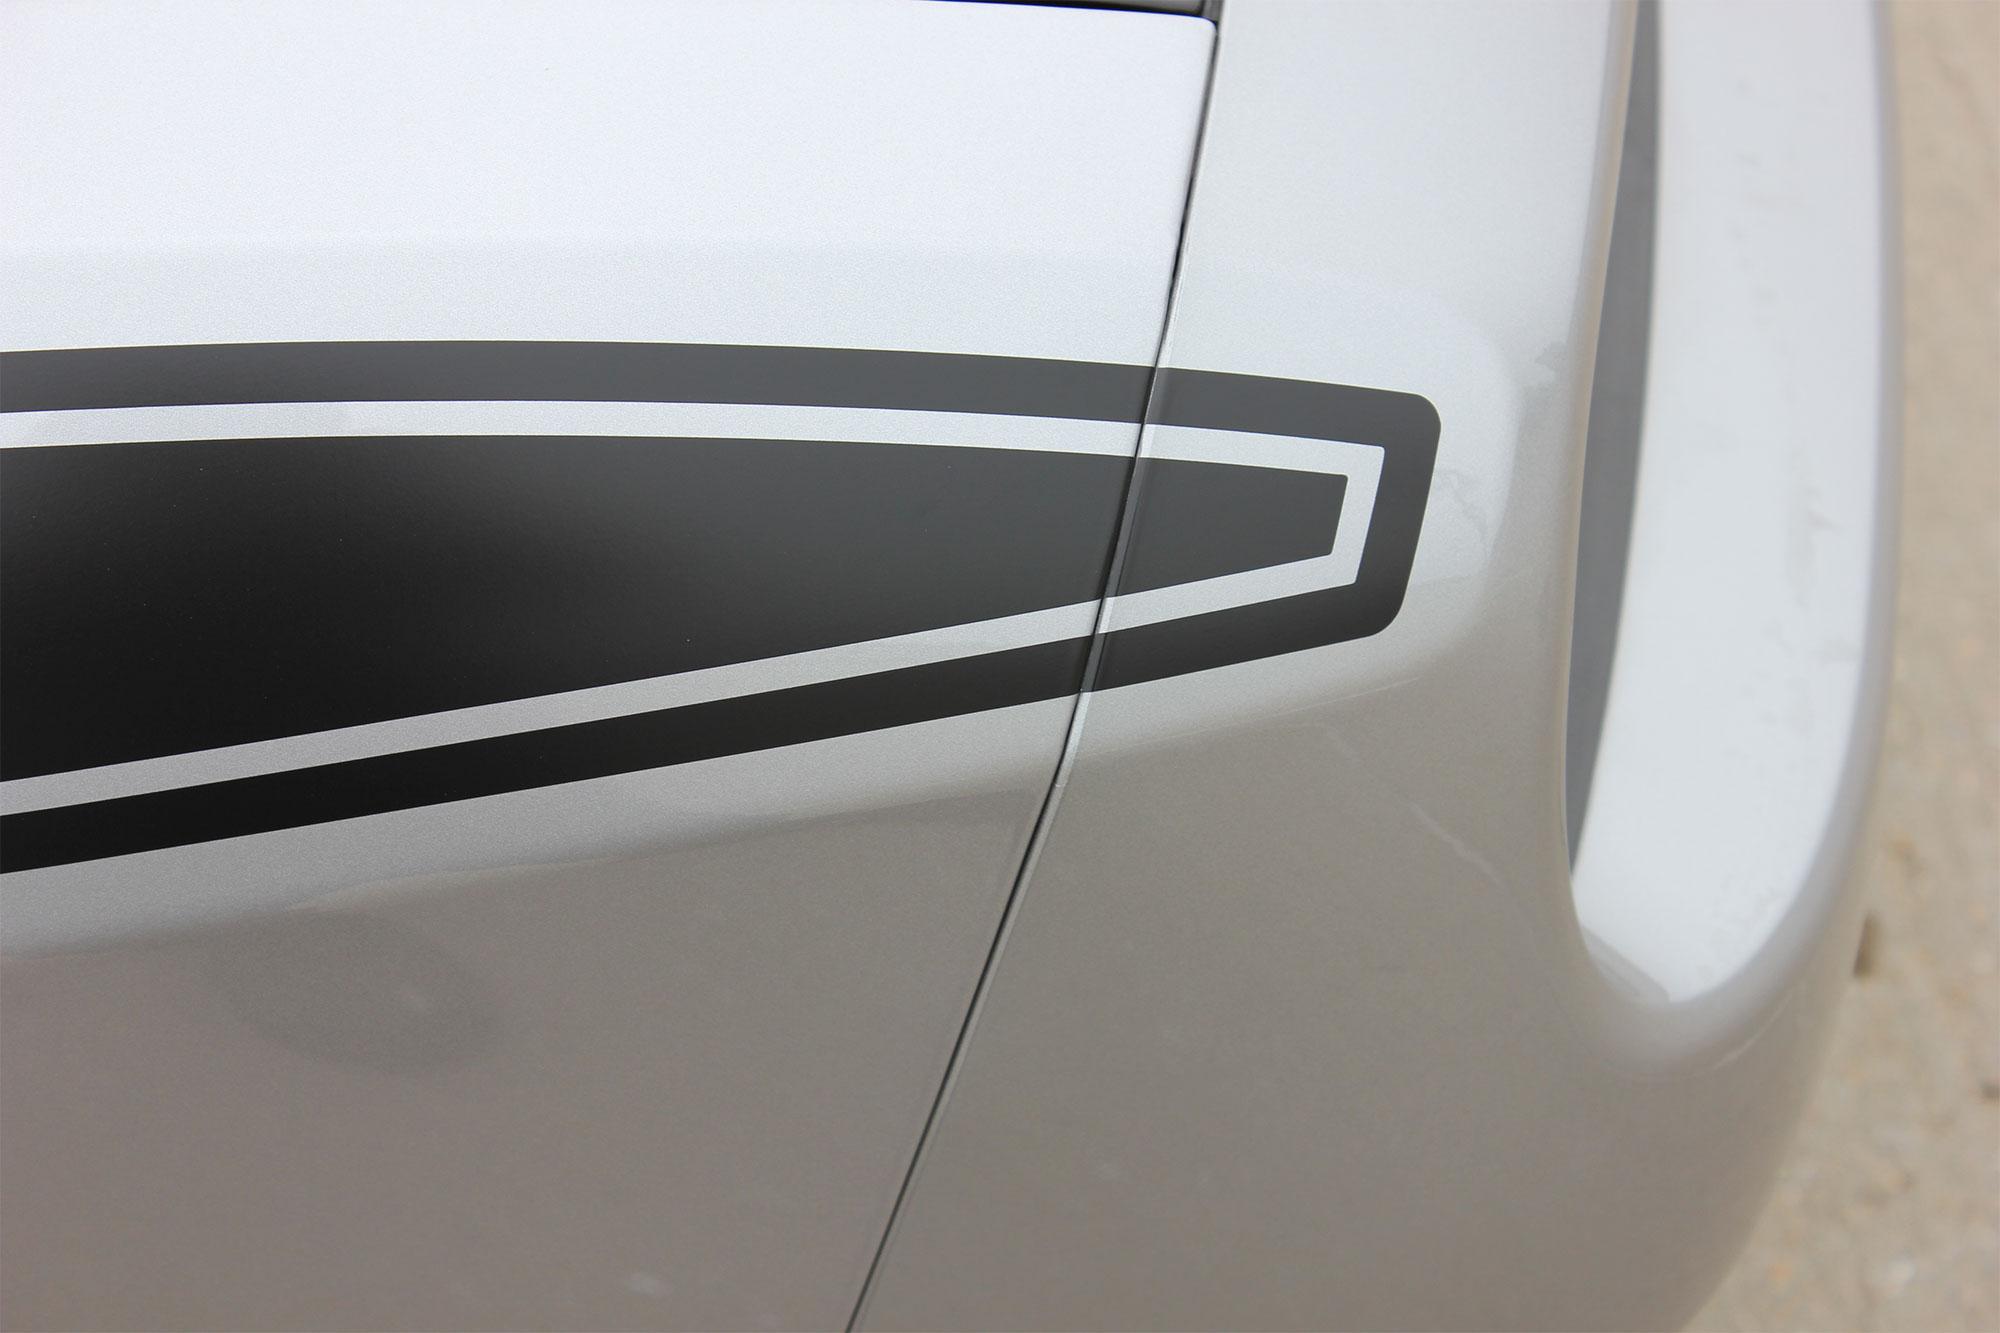 Dodge Challenger PURSUIT Side Stripes 2011 2012 2013 2014 2015 2016 2017 2018 Decals Vinyl Graphics